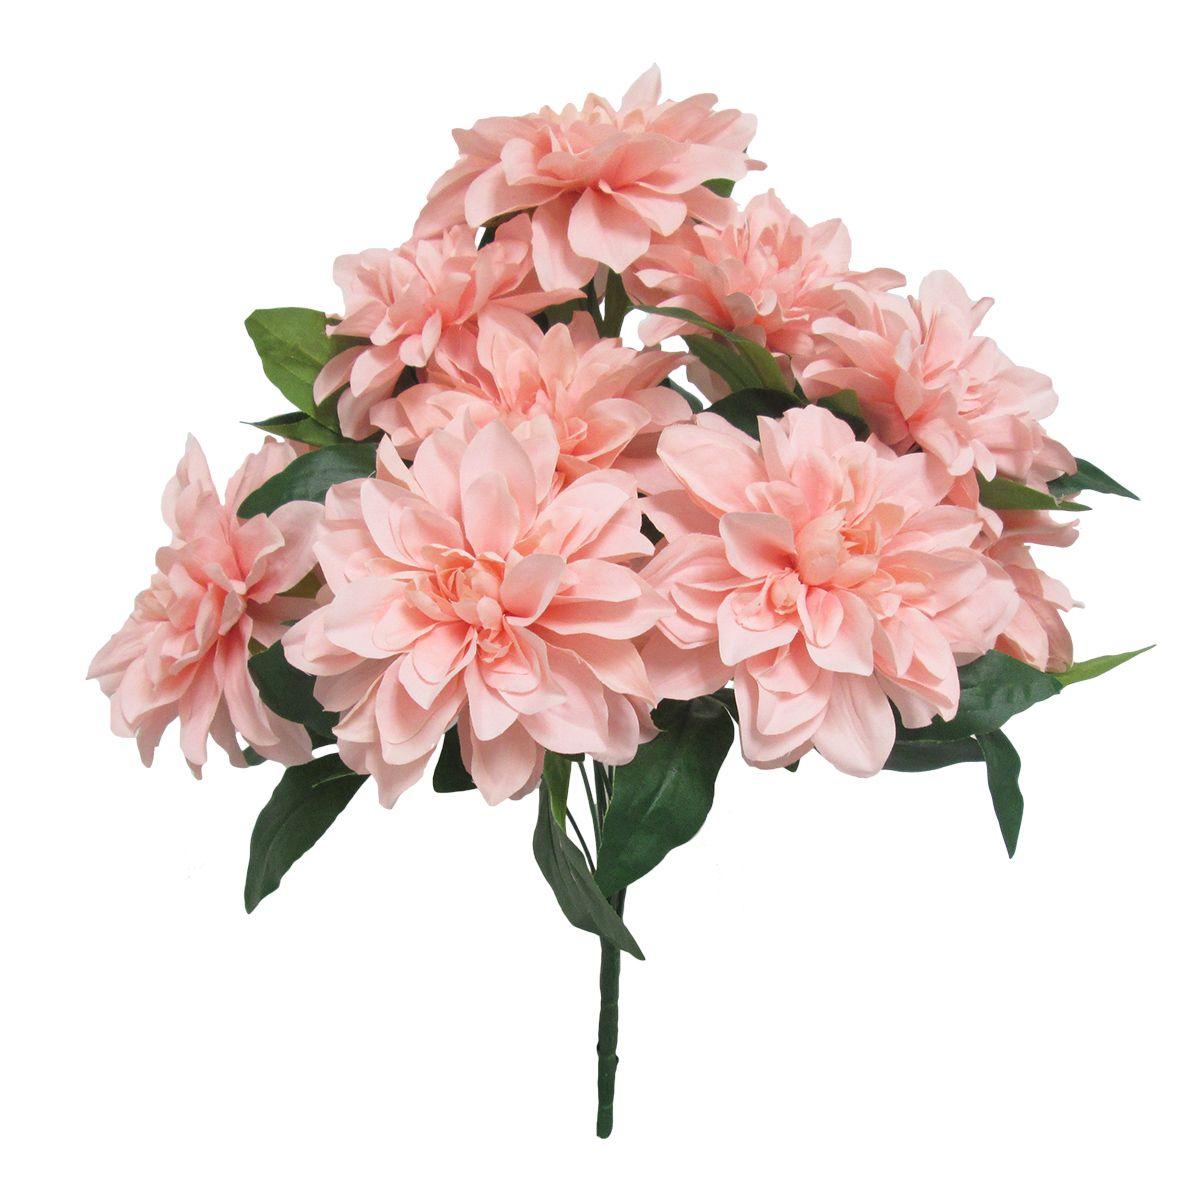 Deluxe Dahlia Bush x10, 18.5in, Blush Pink